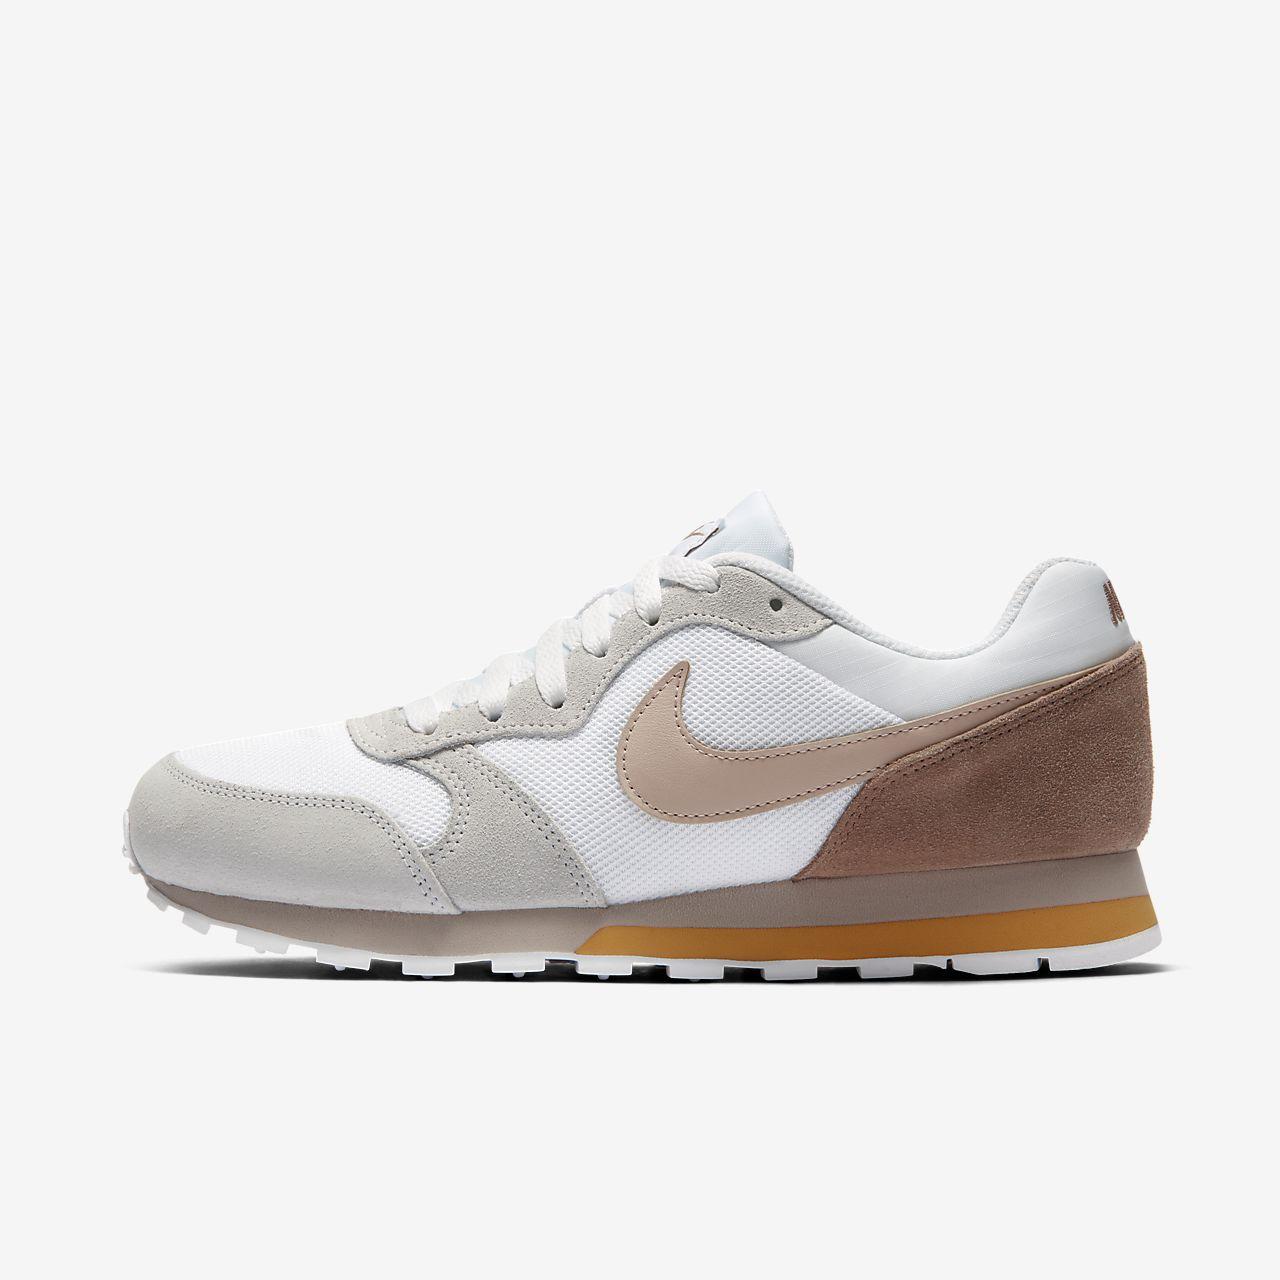 Nike MD Runner 2 Damen Sneaker | SCHUHPARK Online Shop